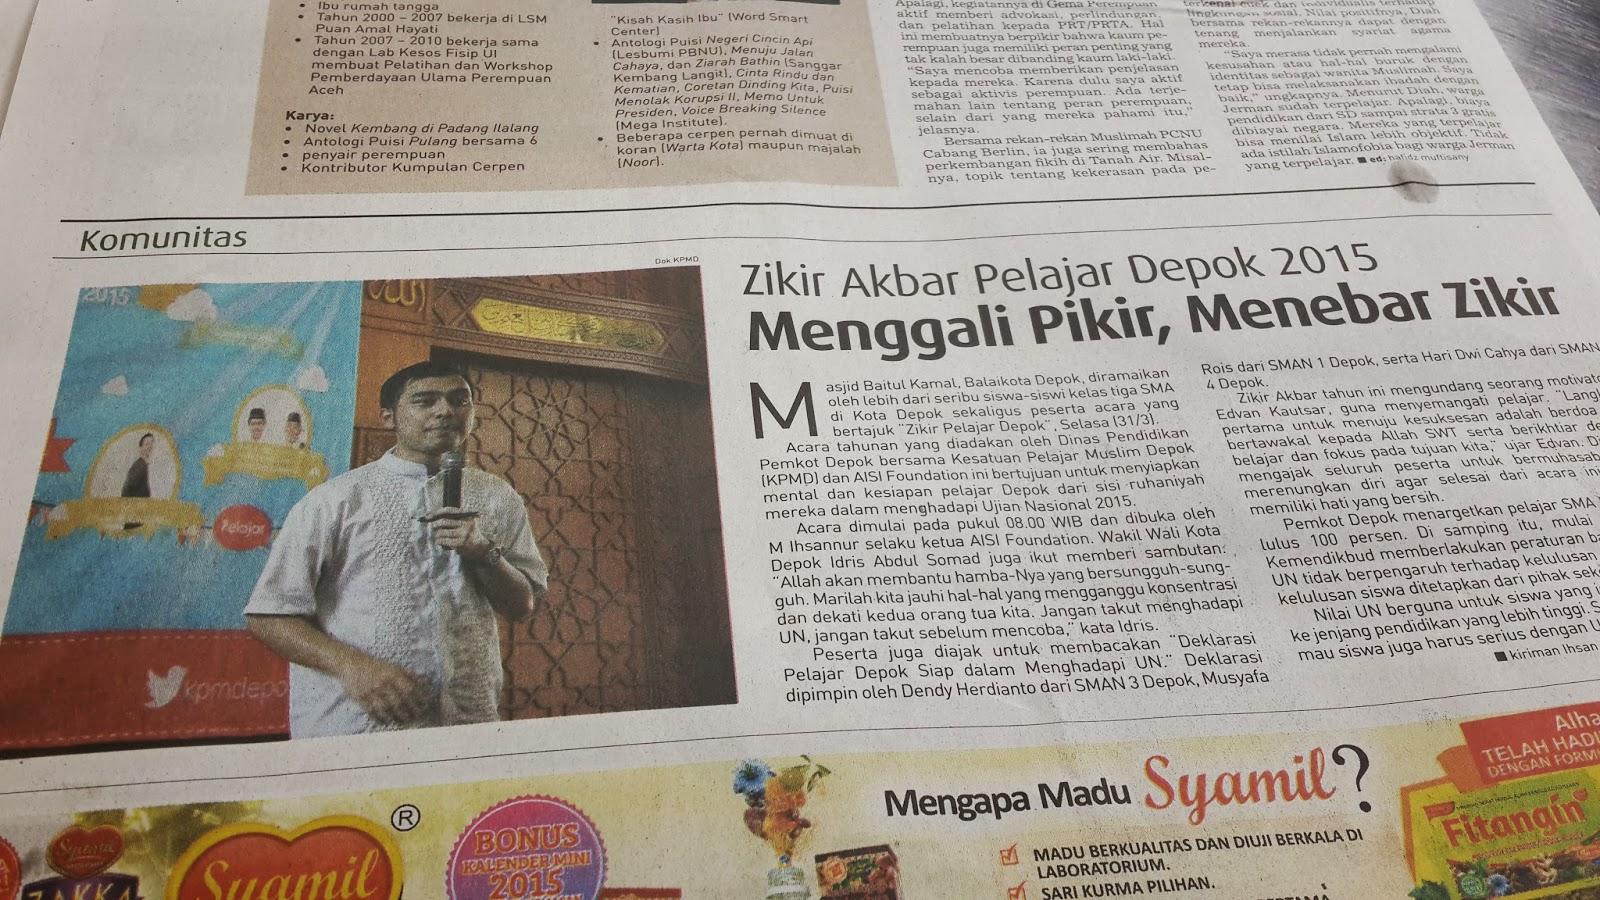 motivator indonesia, motivator muda, motivator nasional, motivator muhasabah, motivator muda, motivator terbaik, edvan m kautsar